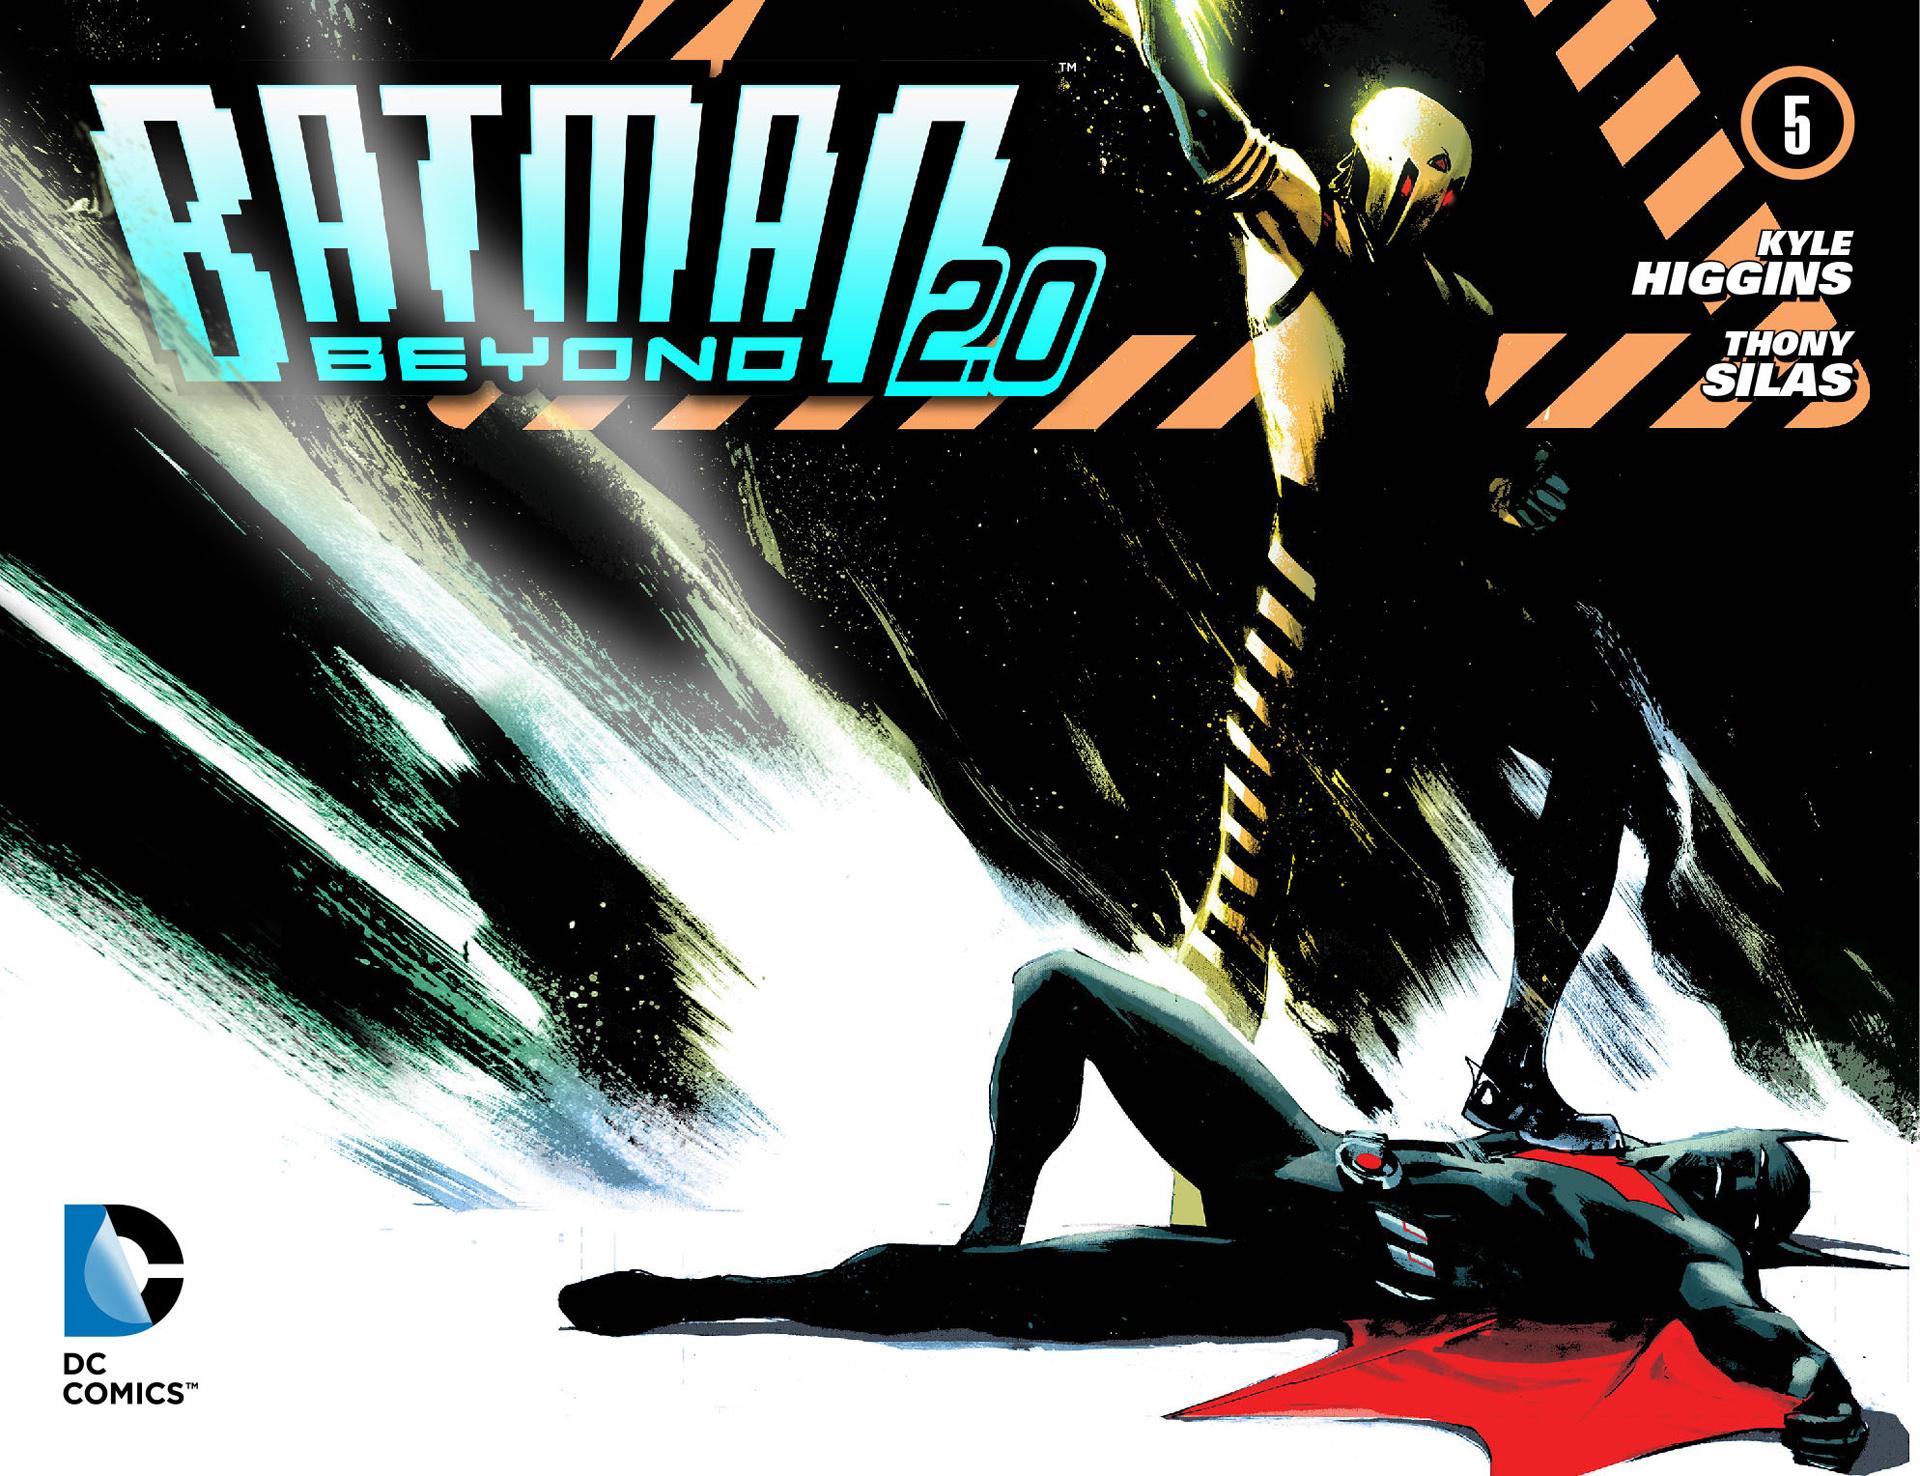 Batman Beyond 2.0 Issue #5 #5 - English 1